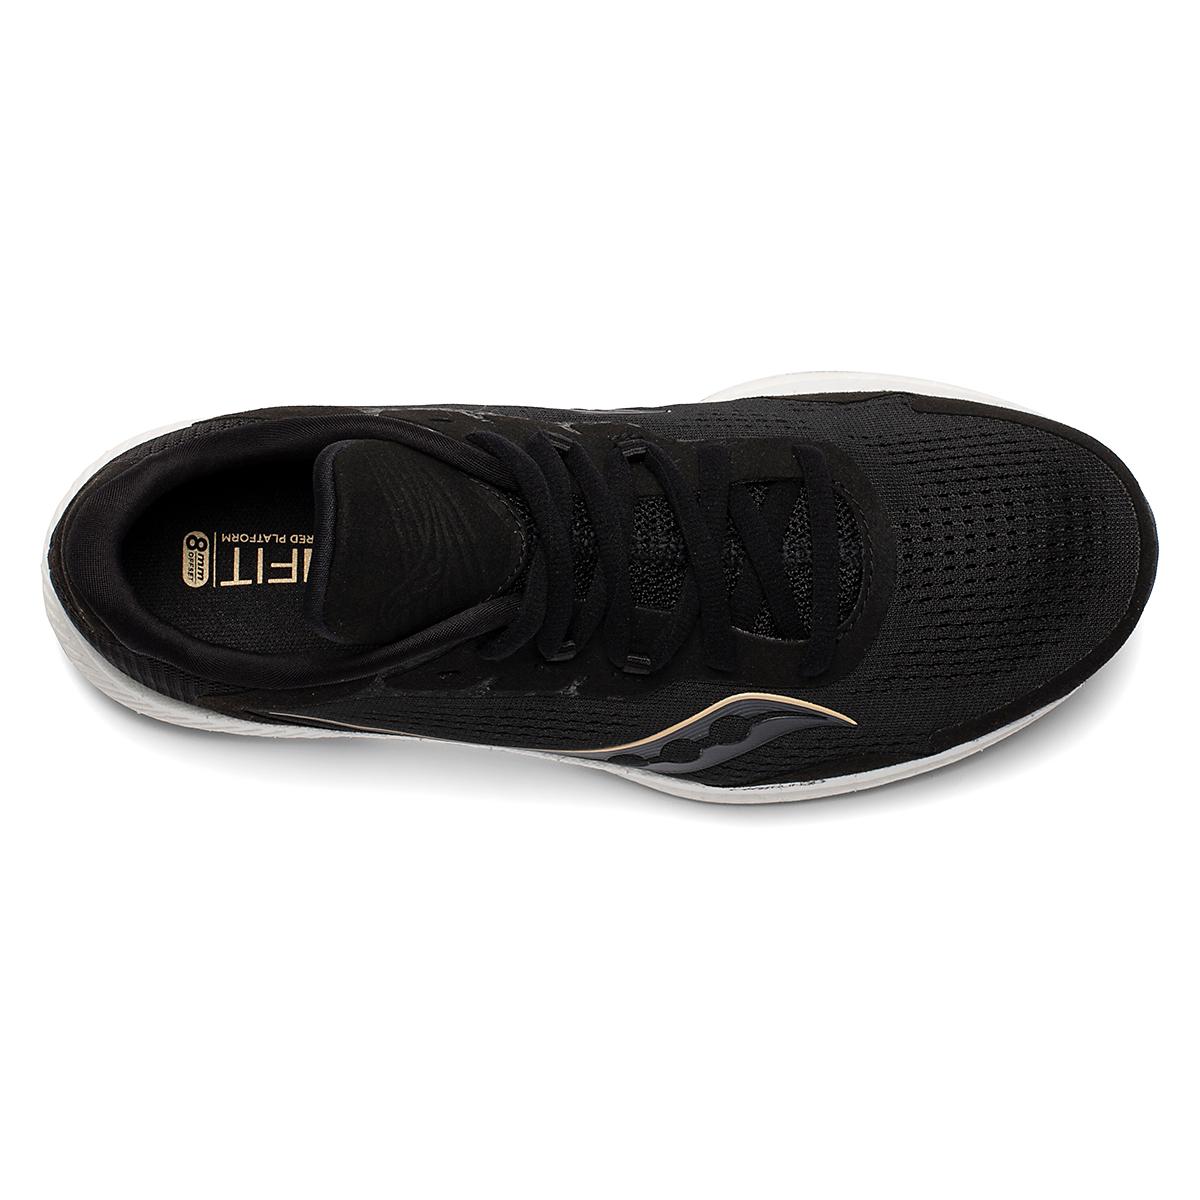 Women's Saucony Freedom 4 Running Shoe - Color: Black/Sunset - Size: 5 - Width: Regular, Black/Sunset, large, image 4